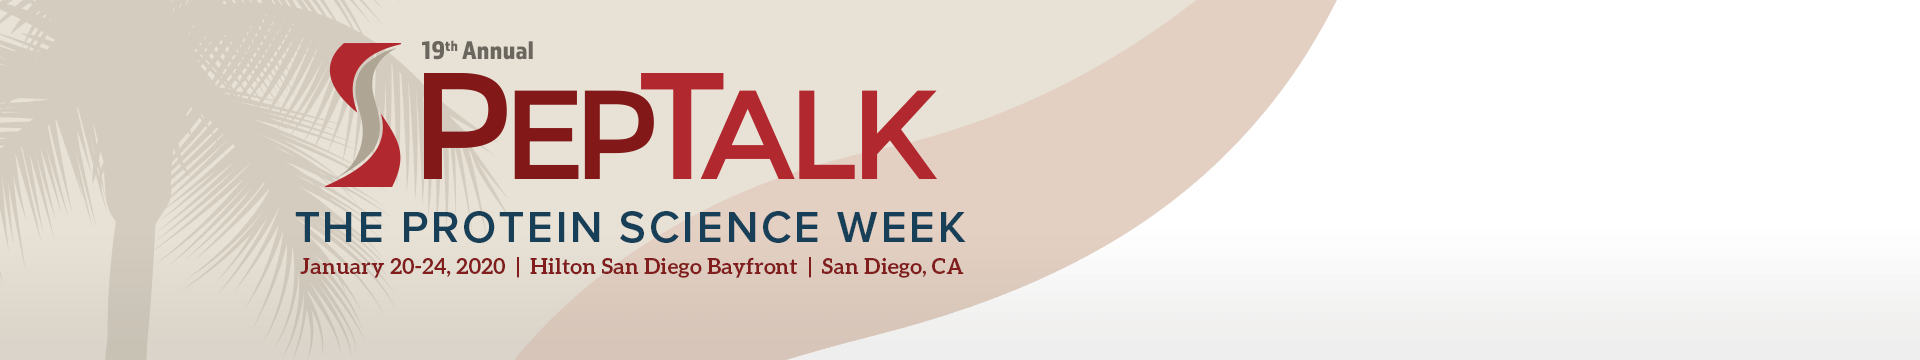 19th Annual PepTalk Protein Science Week - Hilton San Diego Bayfront One Park Boulevard San Diego